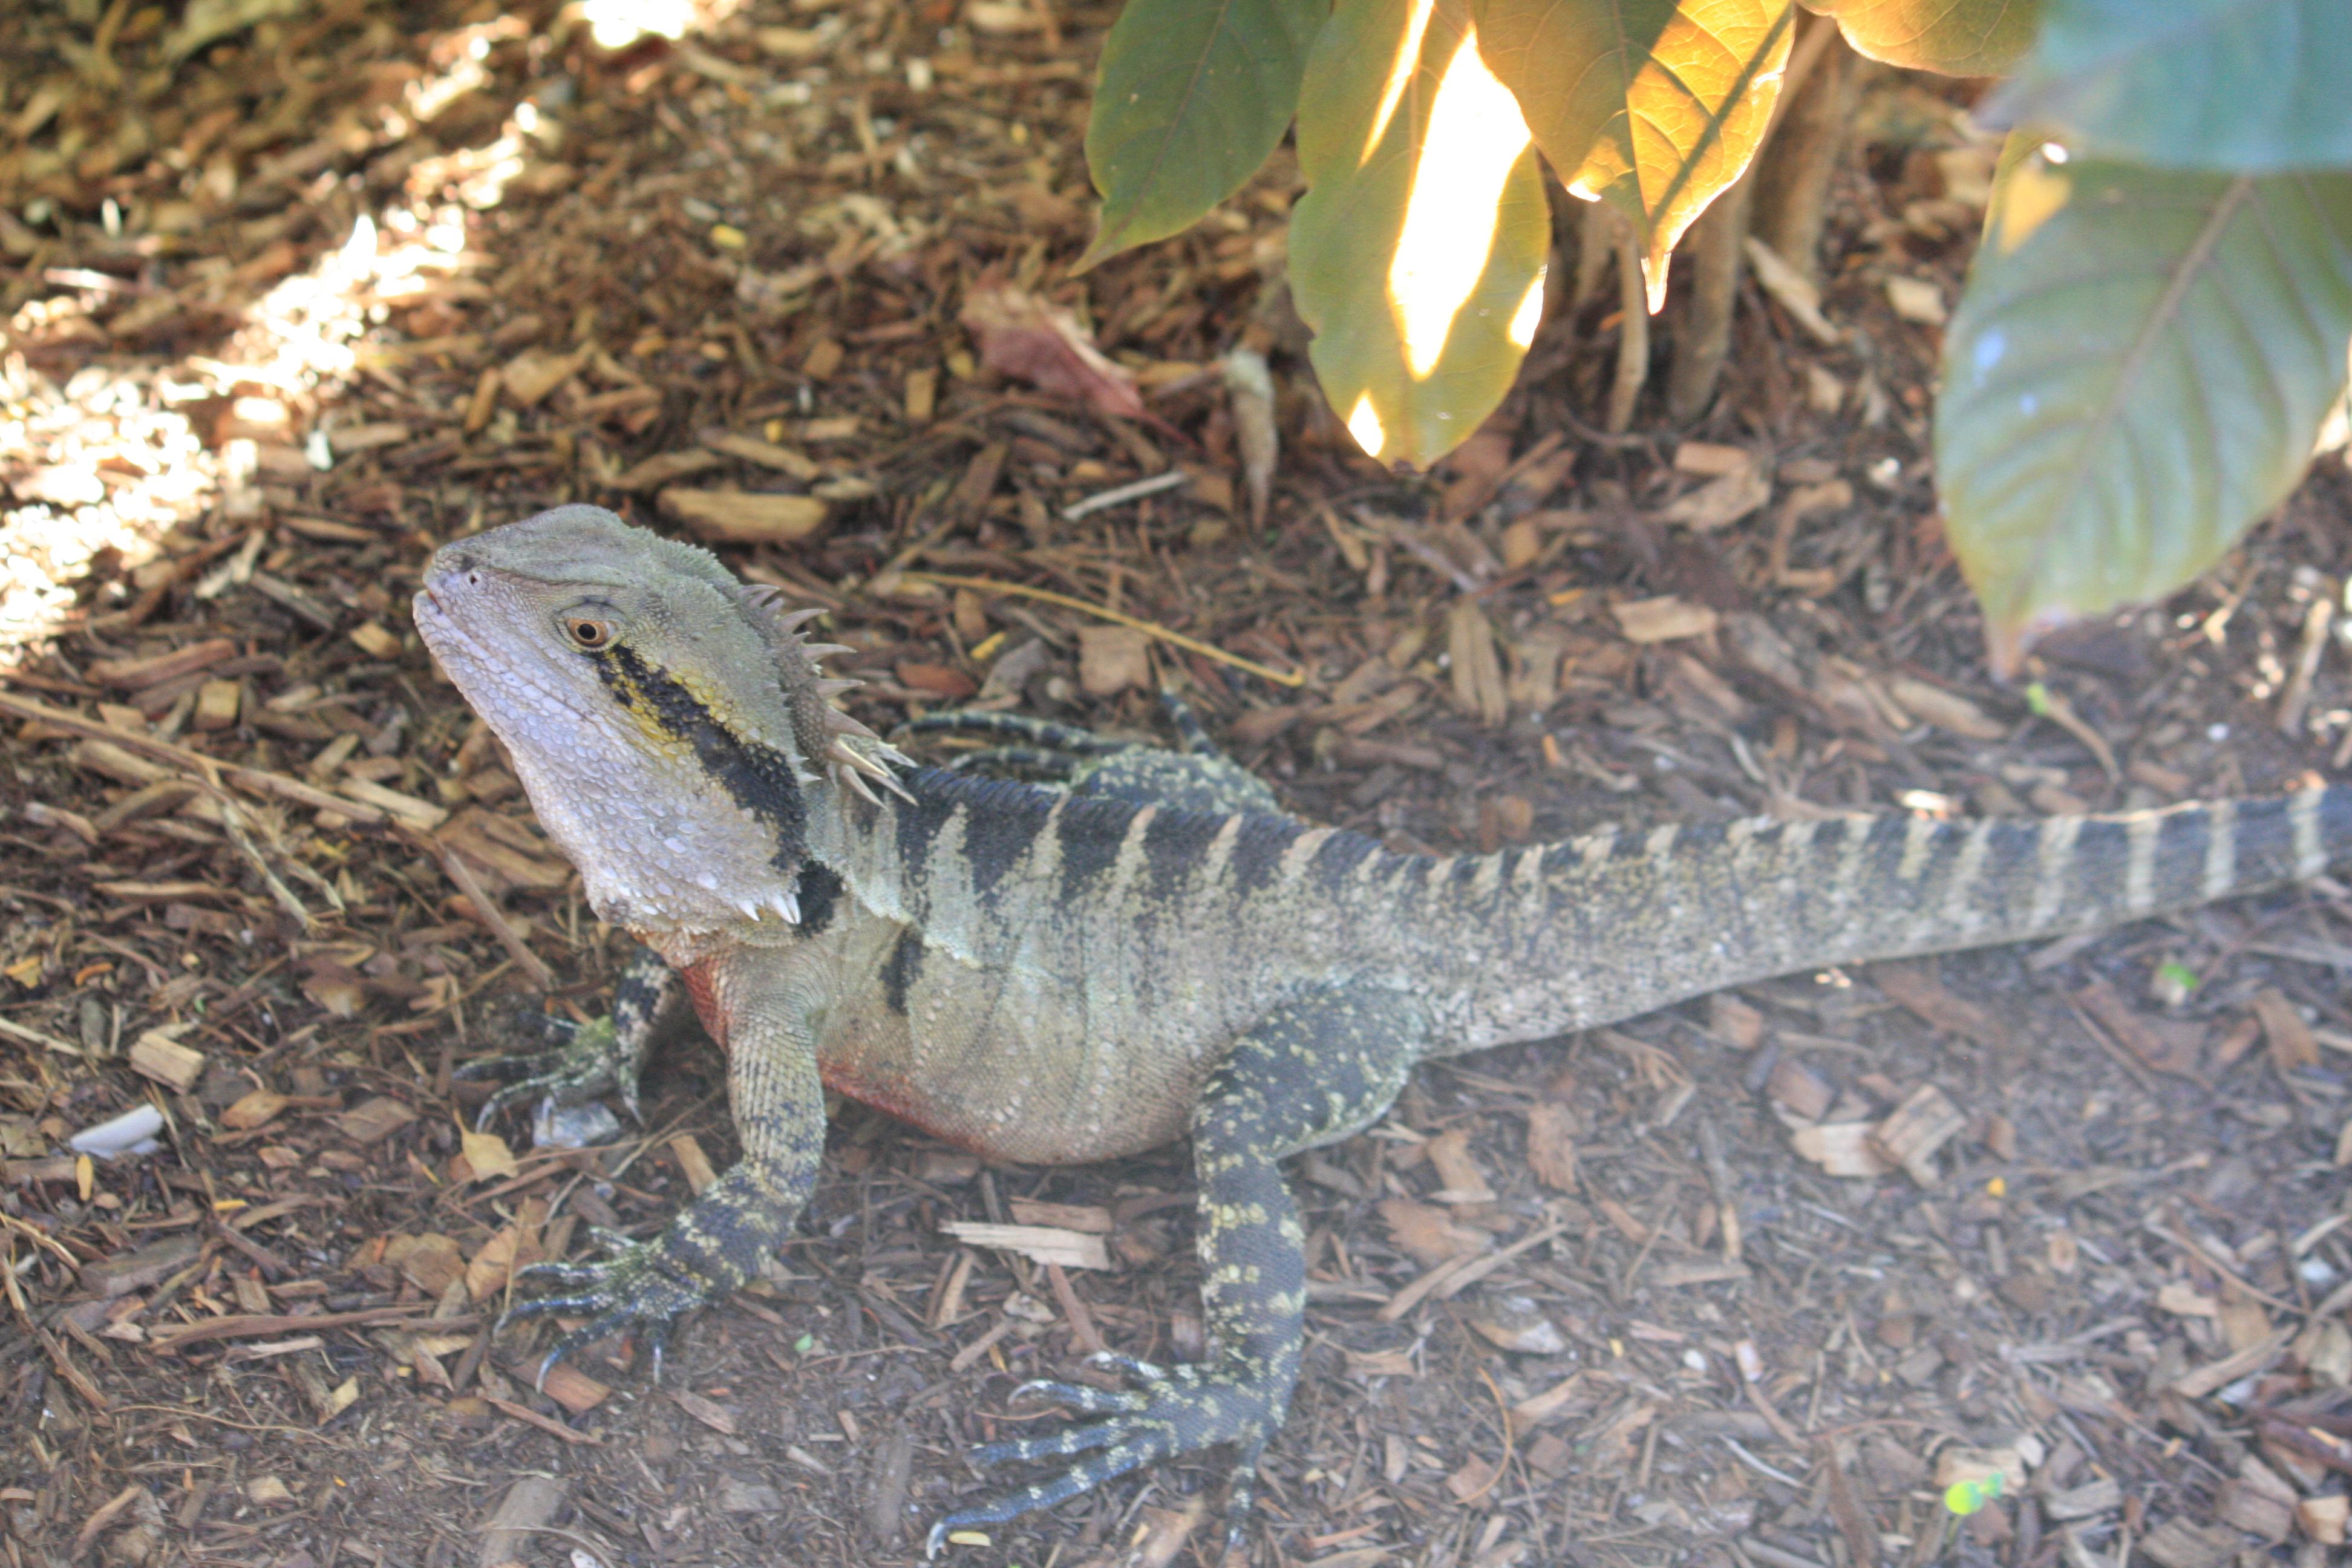 Male Eastern Water Dragon File:male Eastern Water Dragon